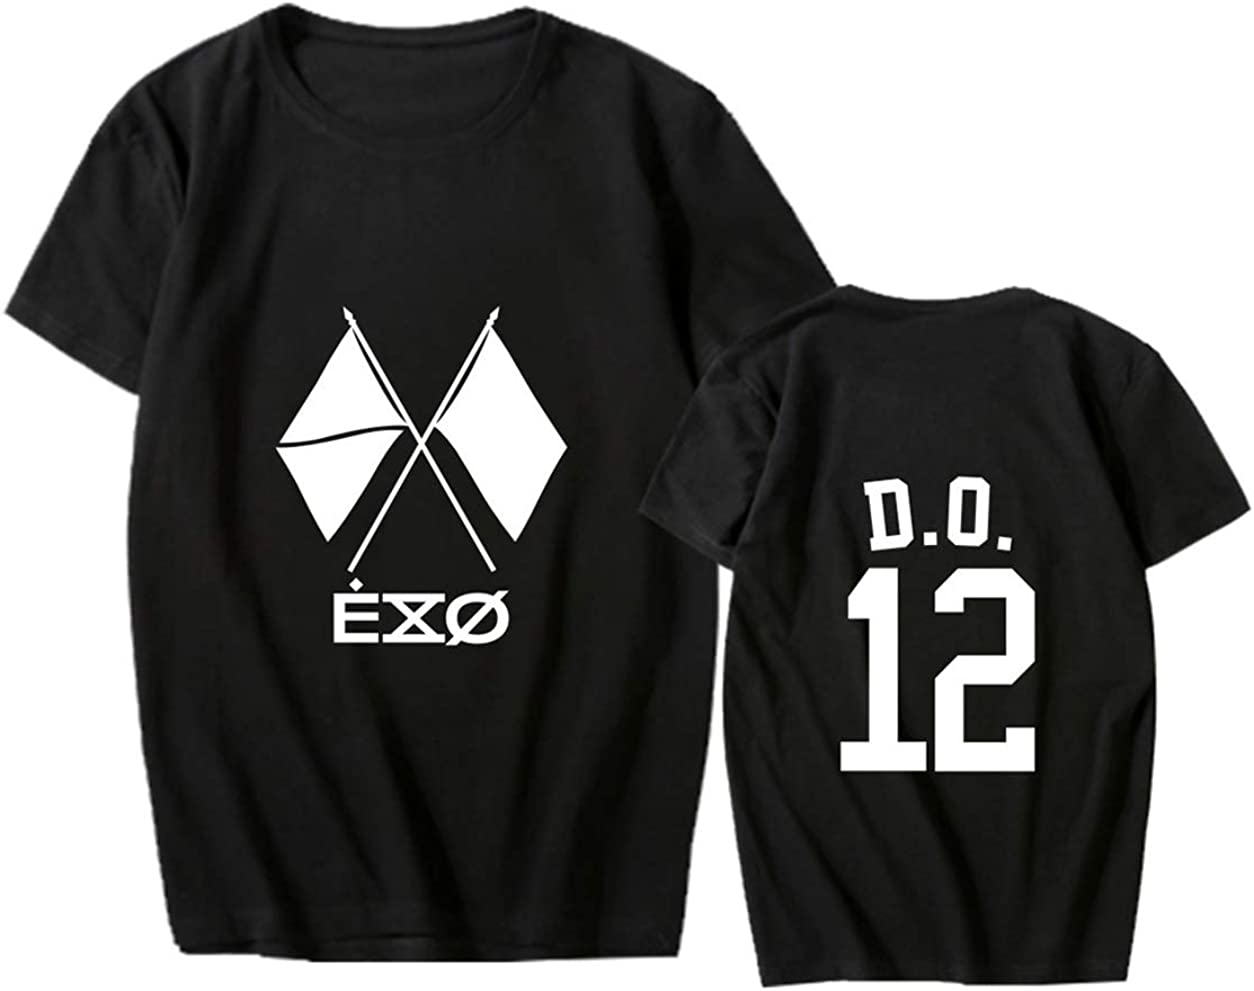 ACEFAST INC Kpop EXO Shirt Obsession T Shirt Baekhyun Kai Suho Xiumin Chanyeol D.O T-Shirt Tops